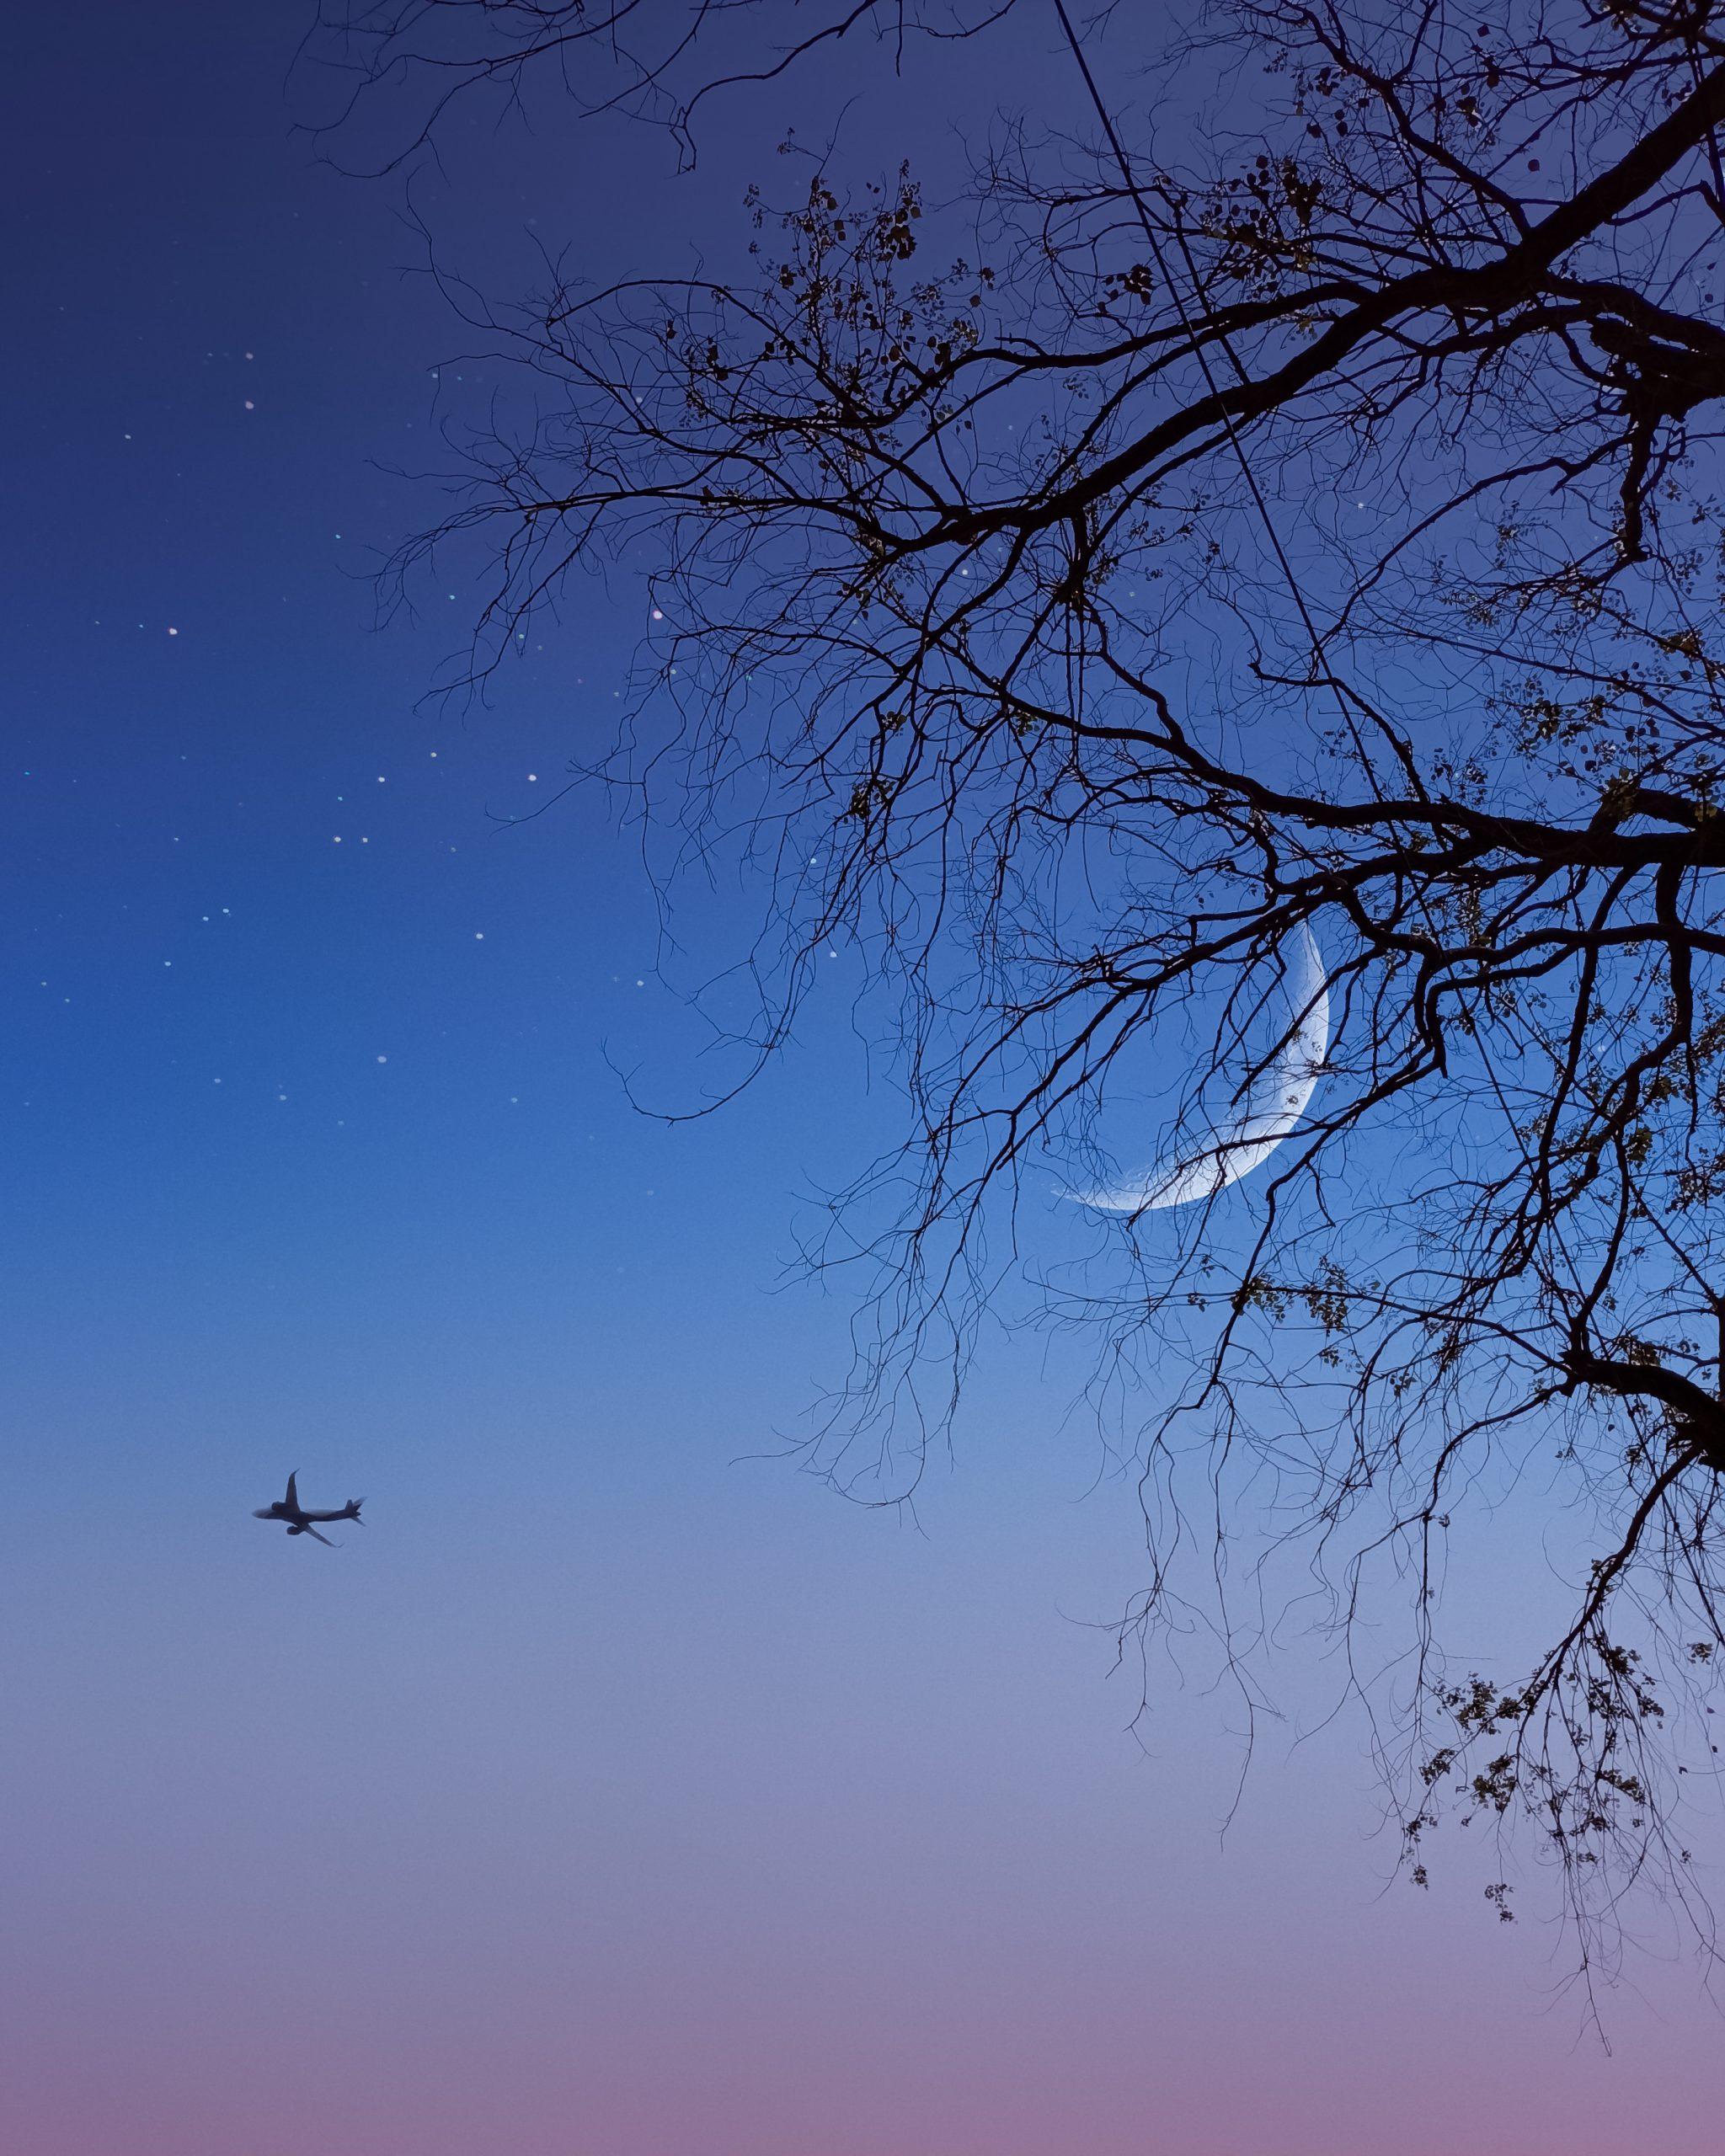 Half moon through the trees